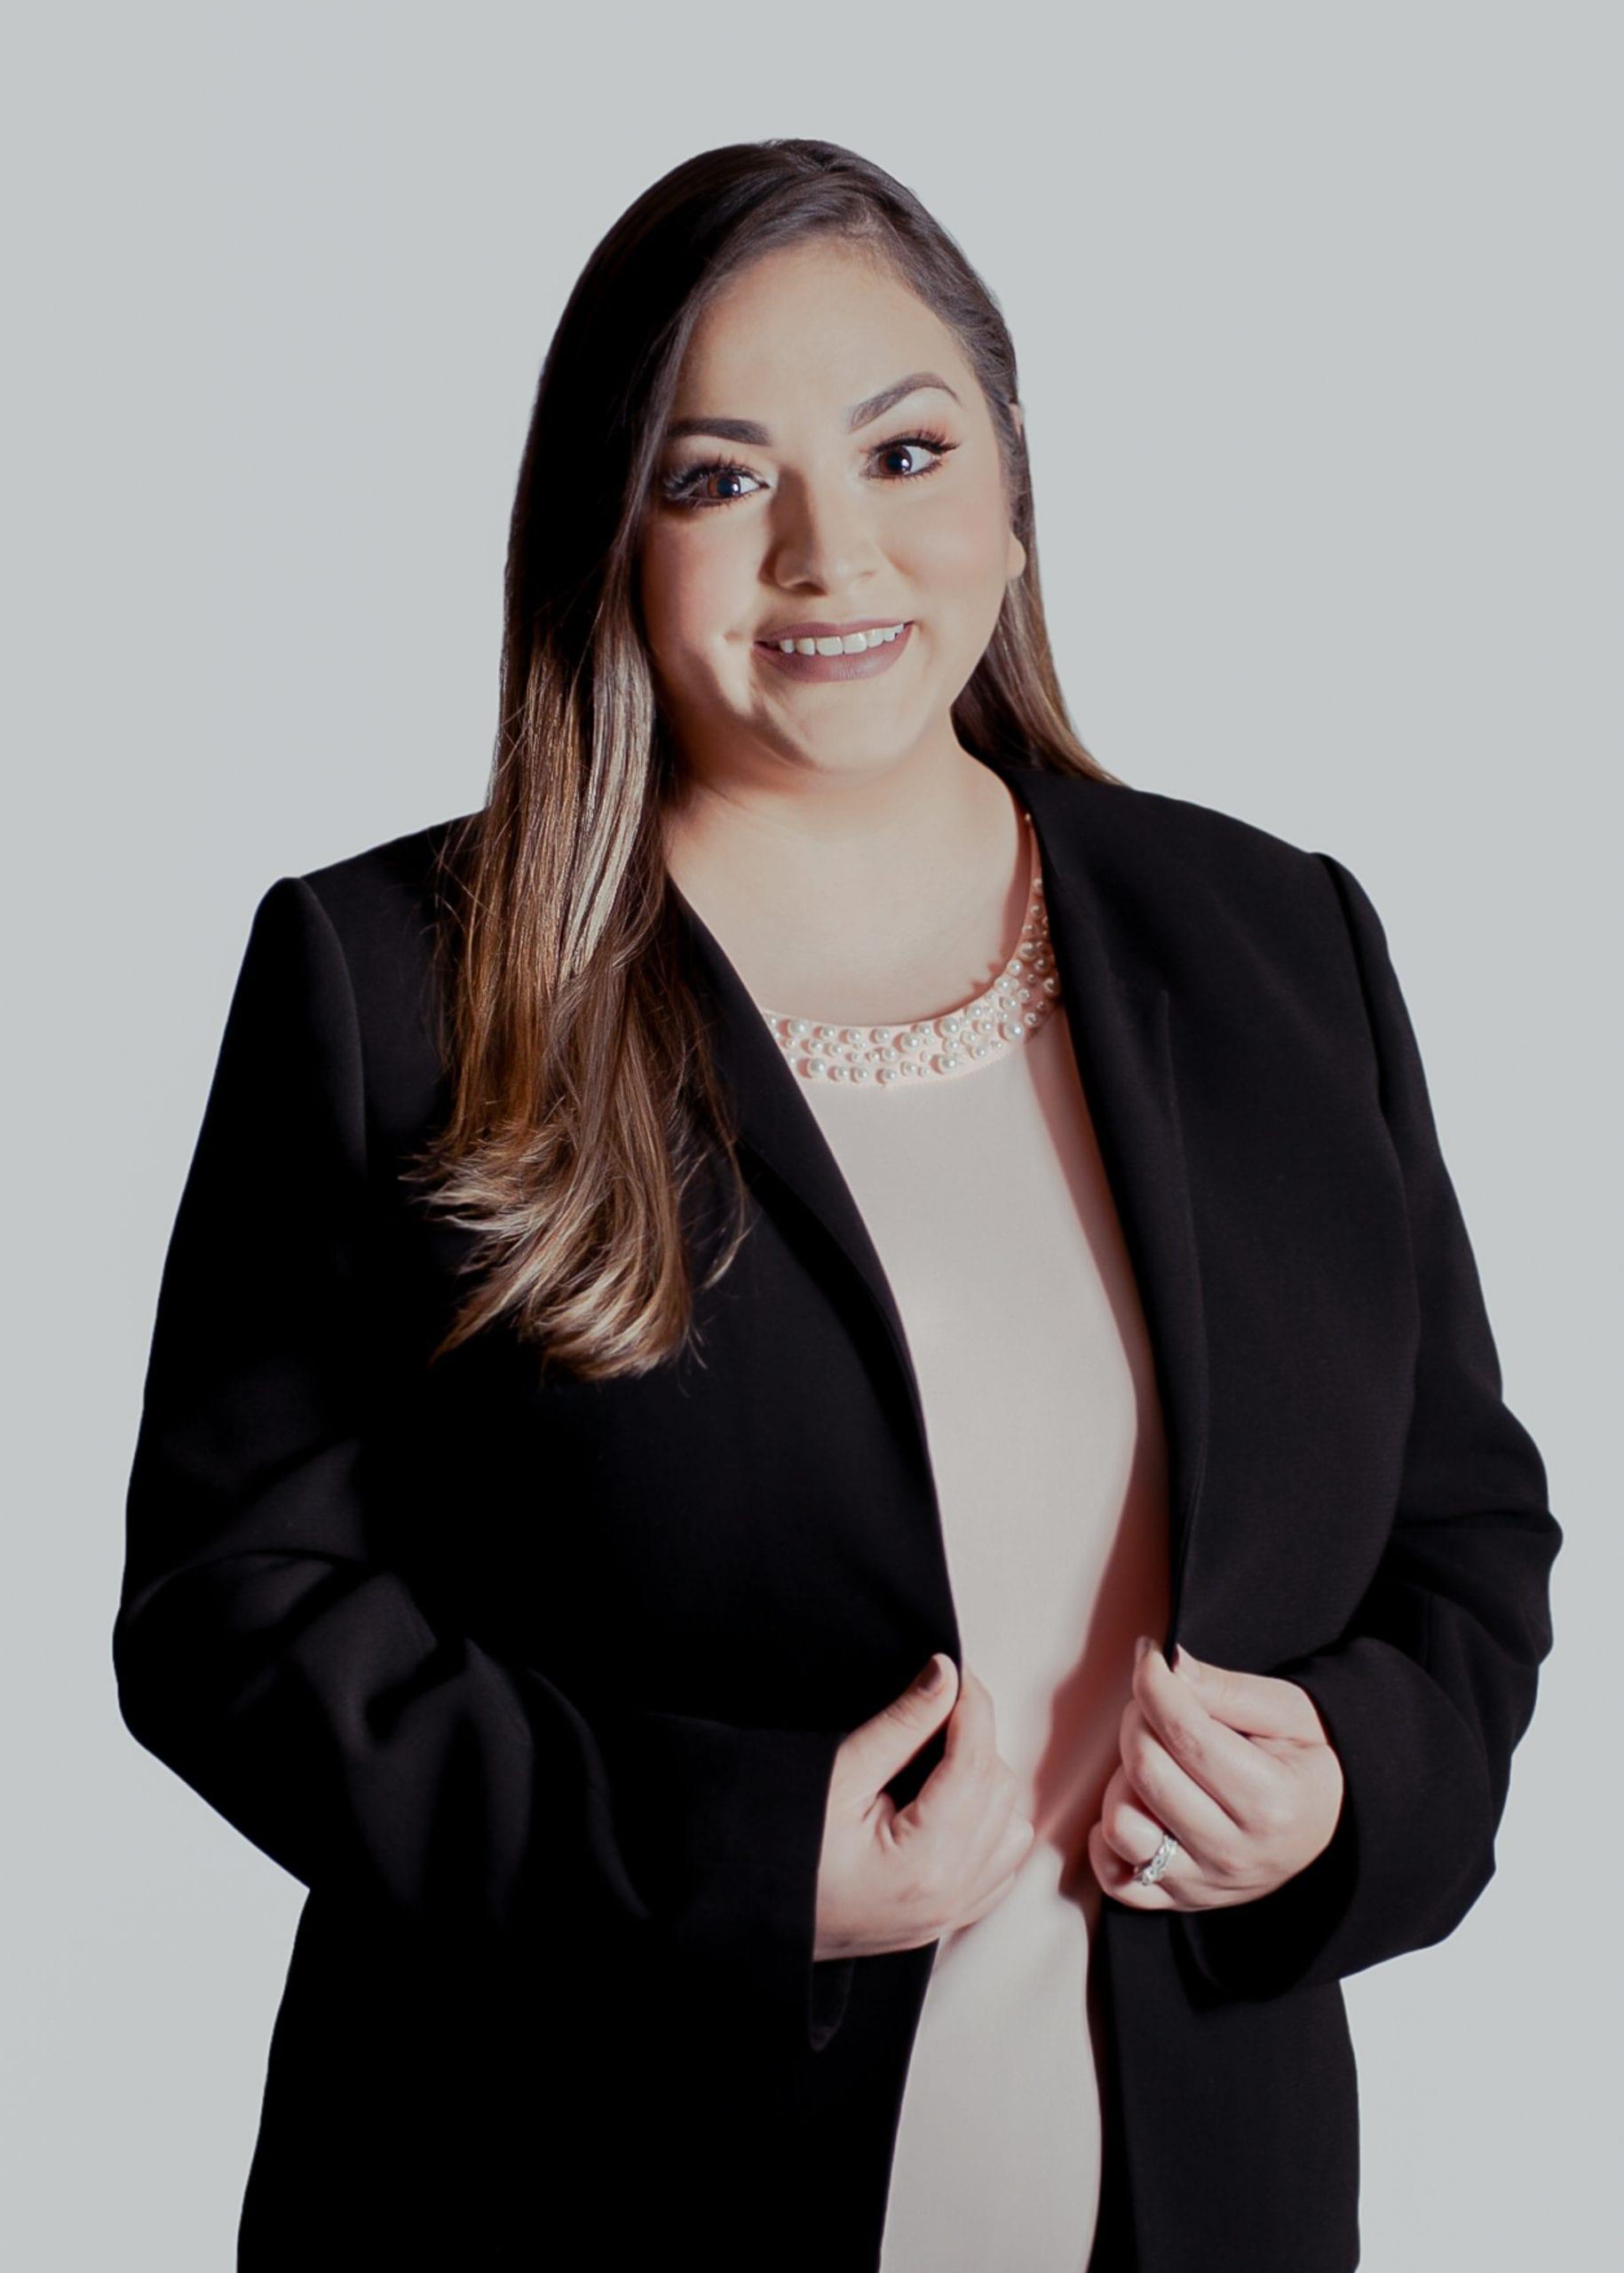 Sandy Verastegui